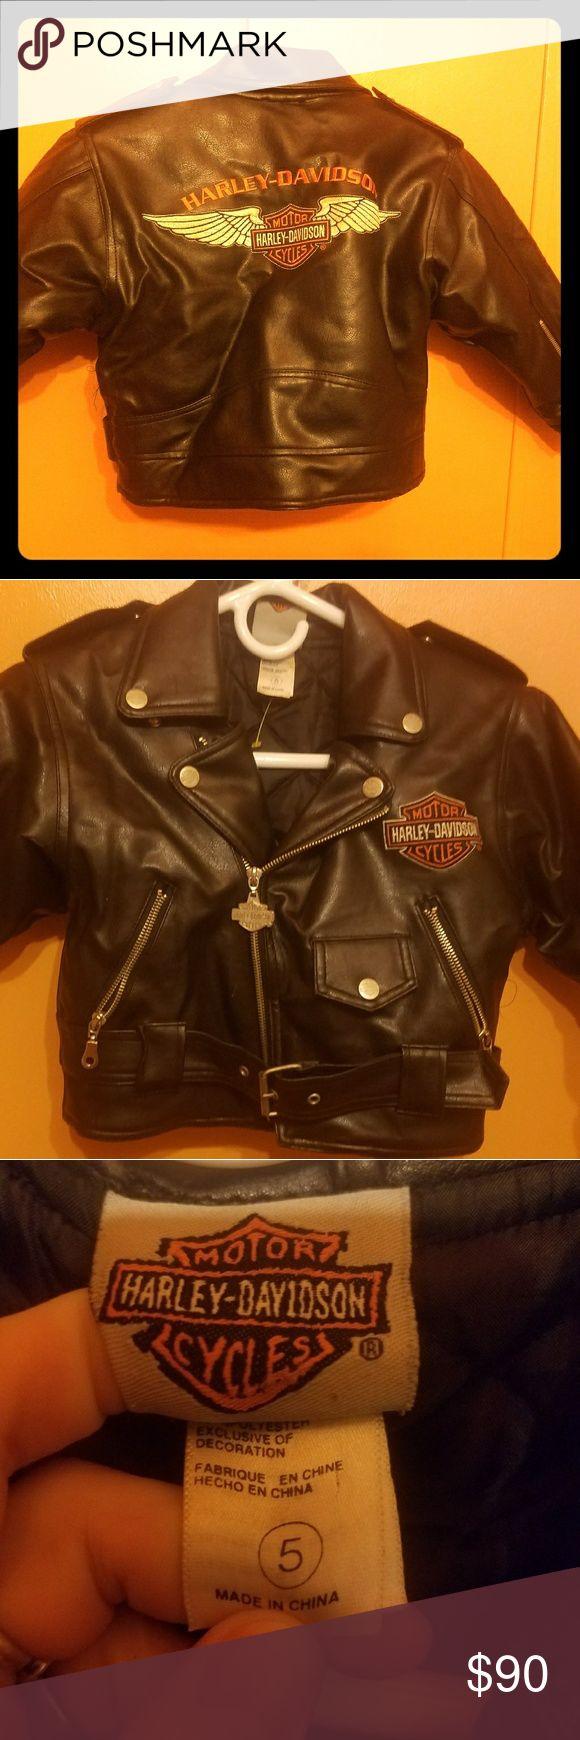 Kid's leather Harley Davidson leather jacket Black leather Harley Davidson jacket. Size 5 children's. Harley-Davidson Jackets & Coats Puffers